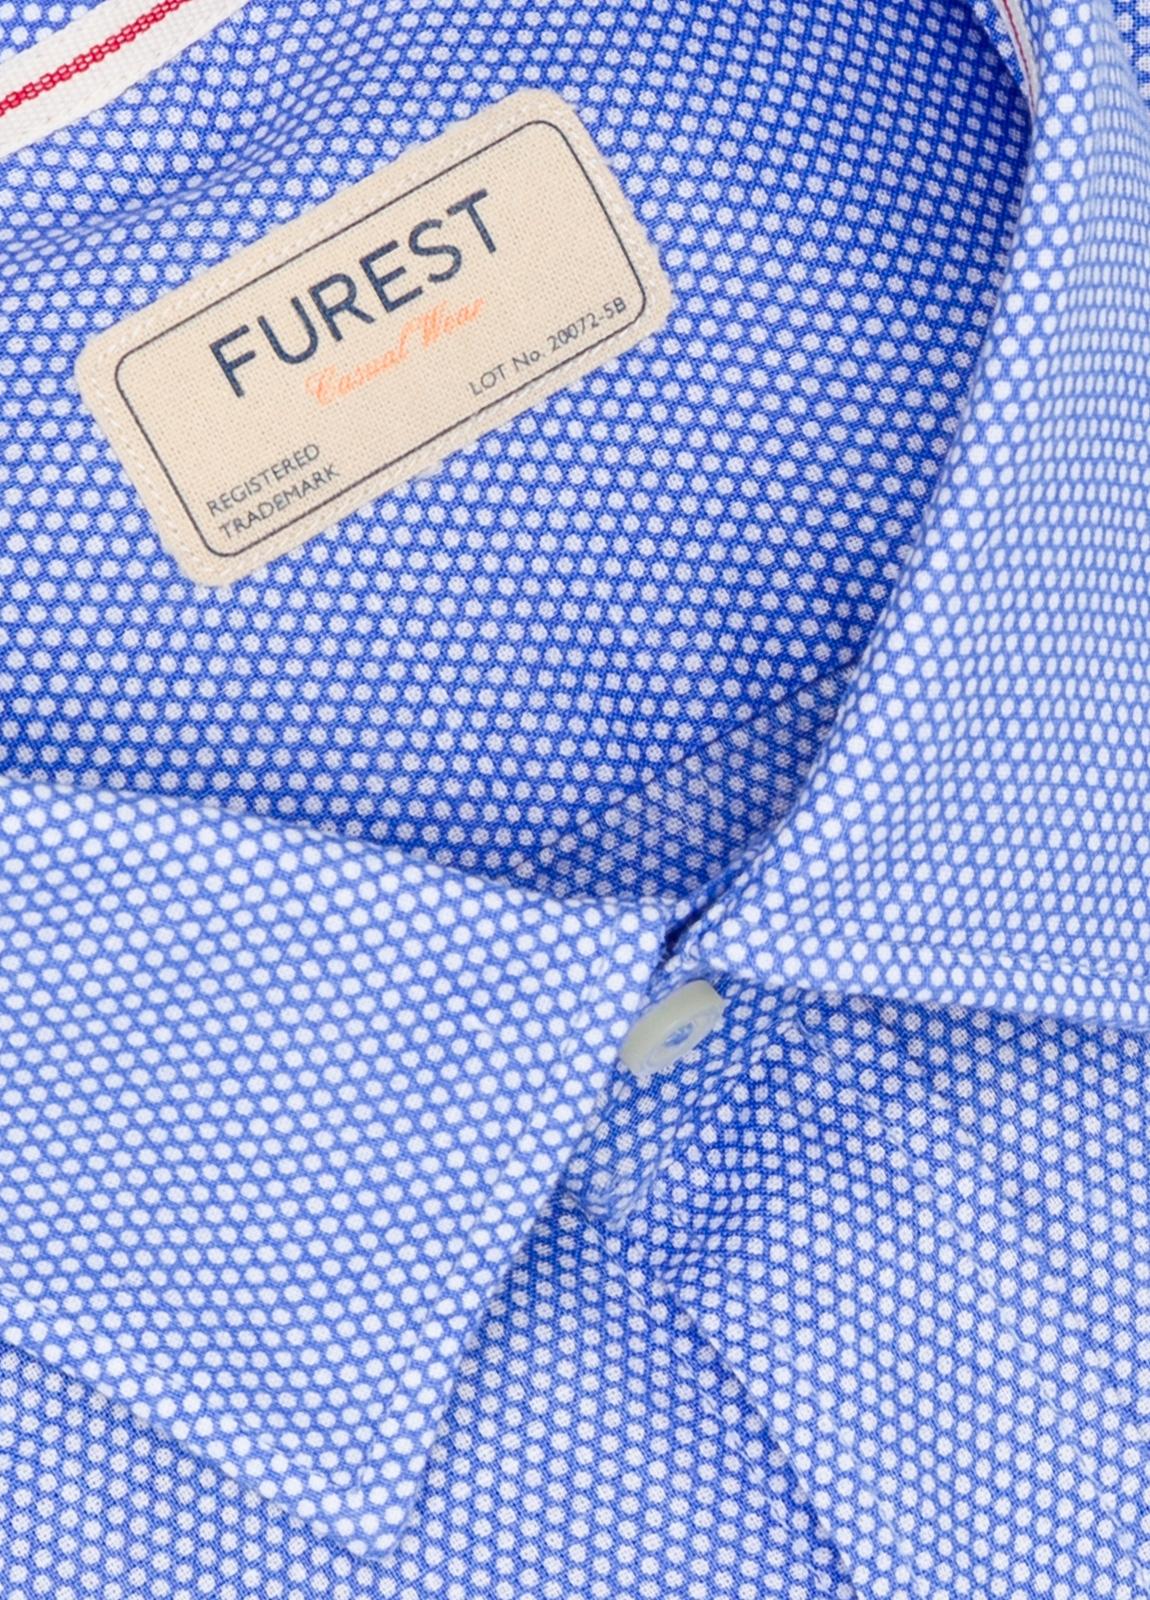 Camisa Casual Wear SLIM FIT Modelo CAPRI diseño topitos color azul. 100% Algodón. - Ítem1